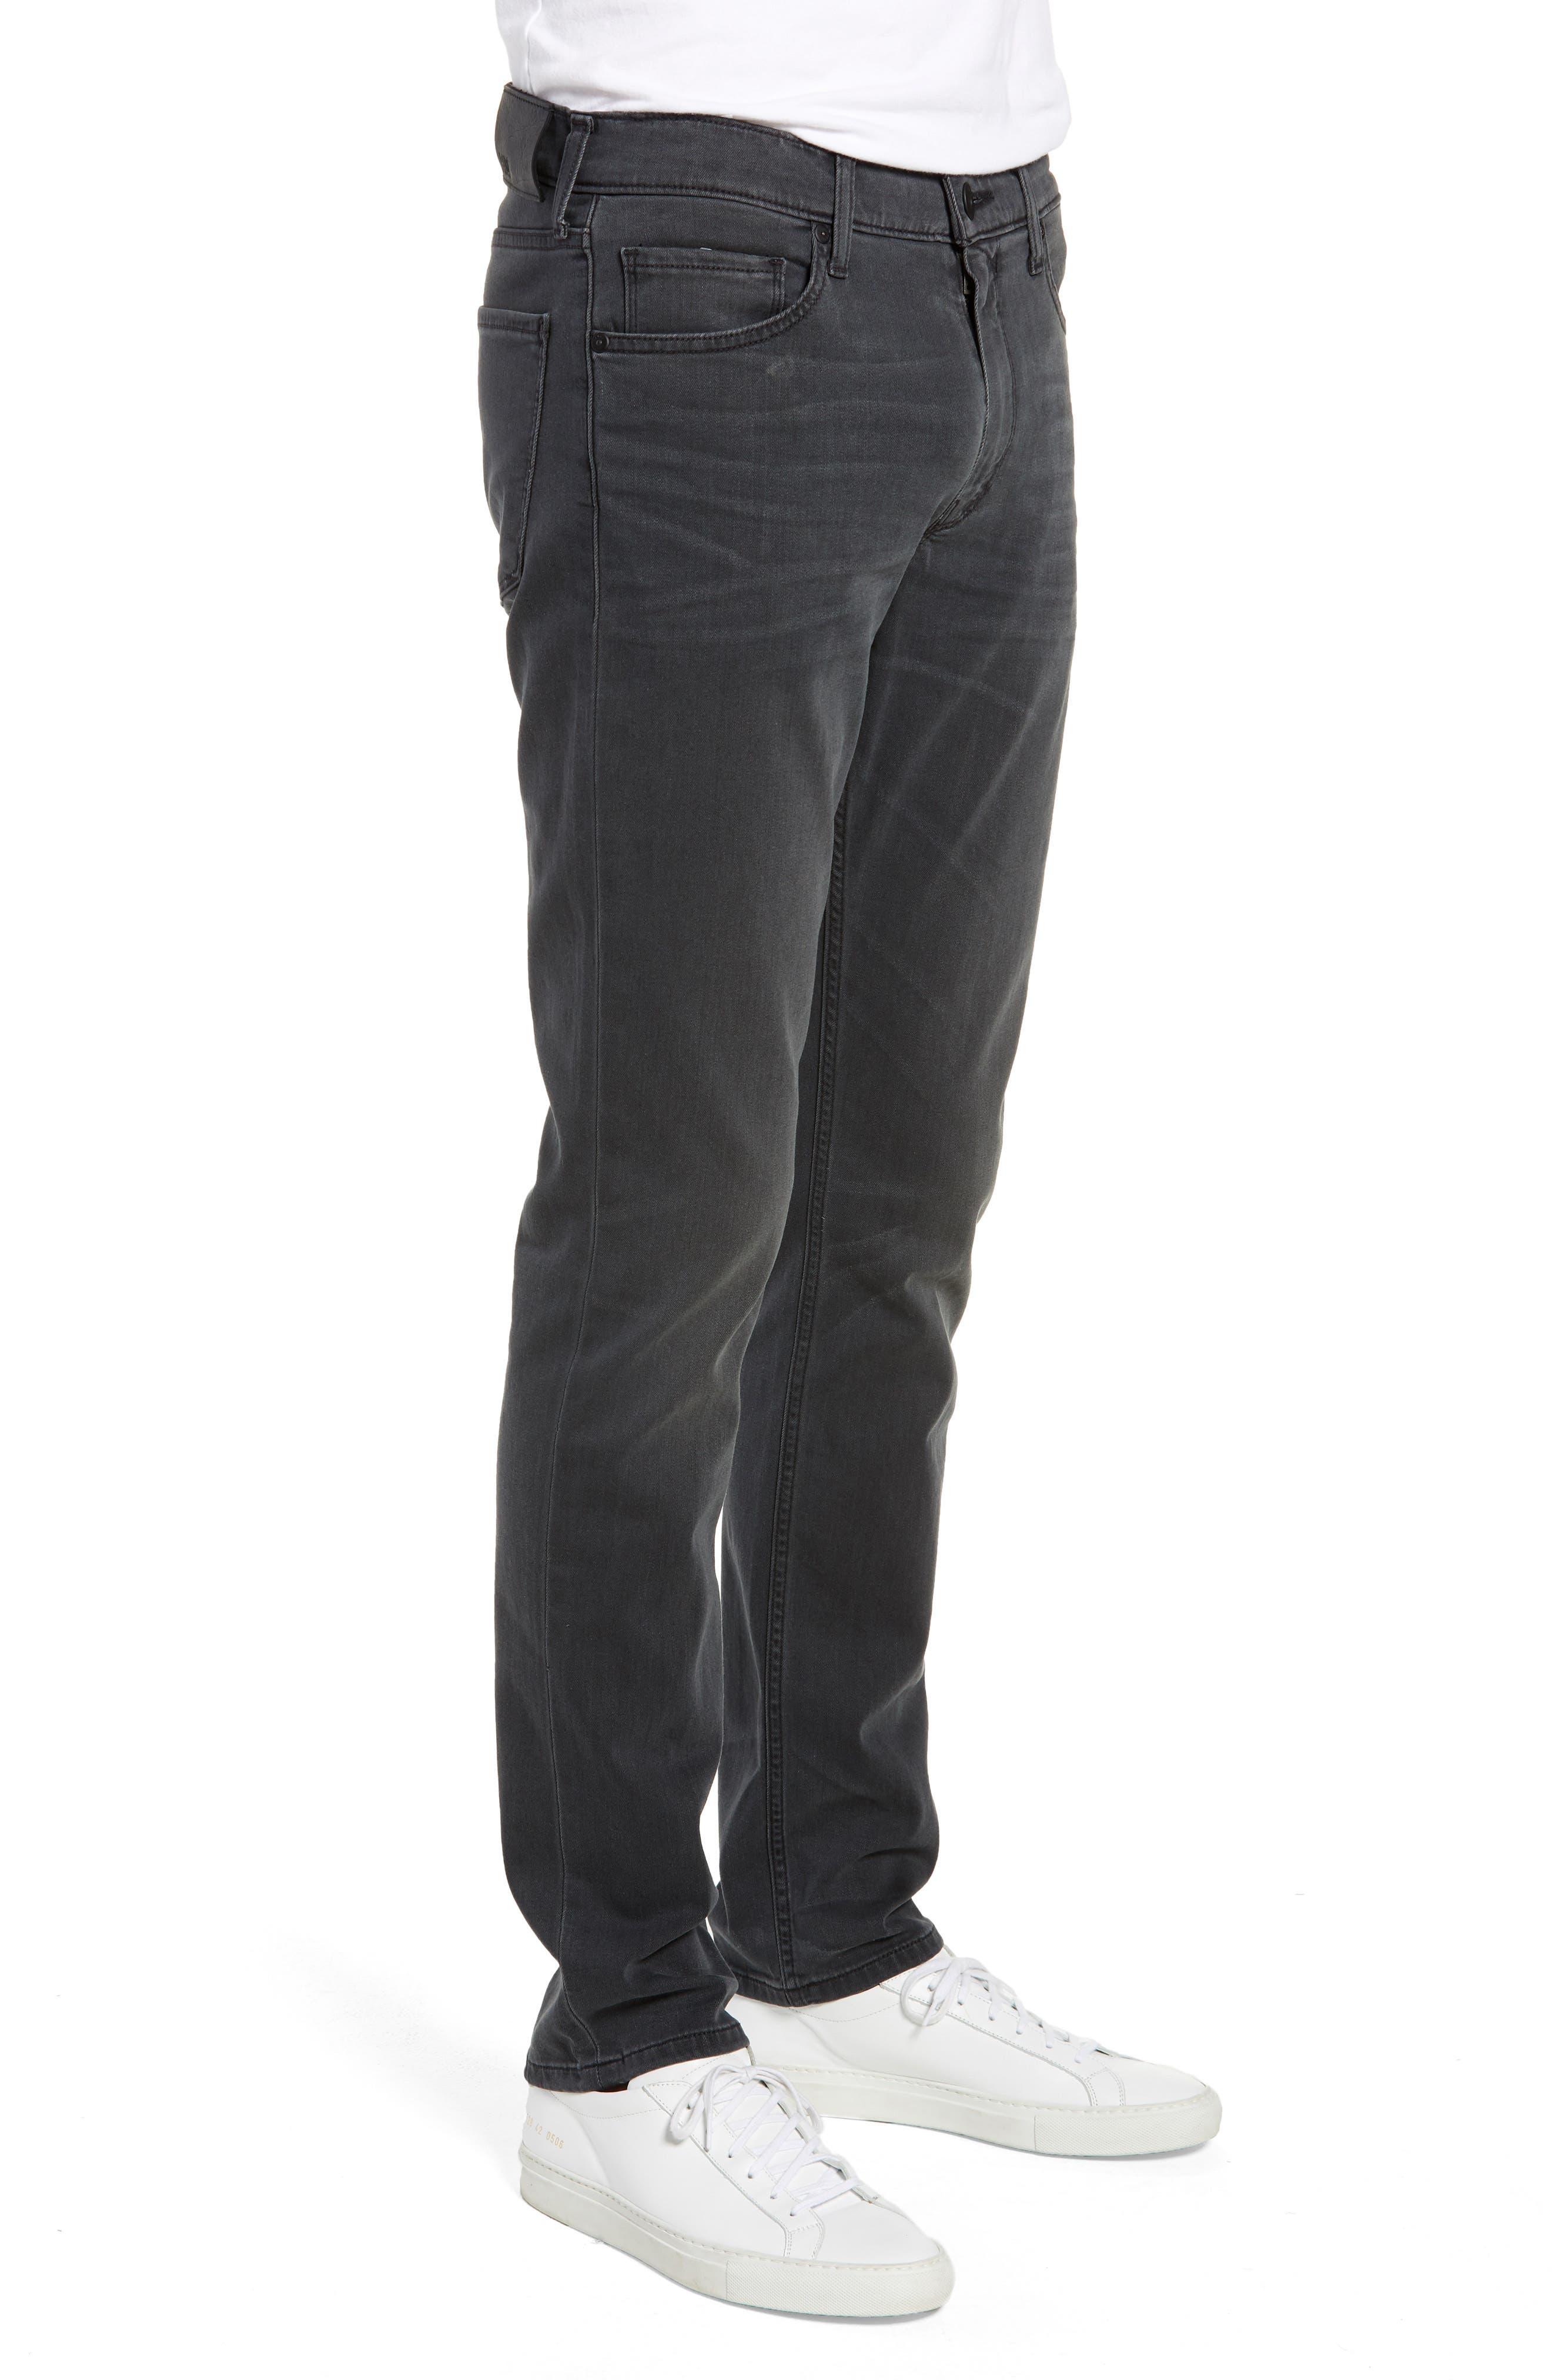 Transcend - Lennox Slim Fit Jeans,                             Alternate thumbnail 3, color,                             SHELDON